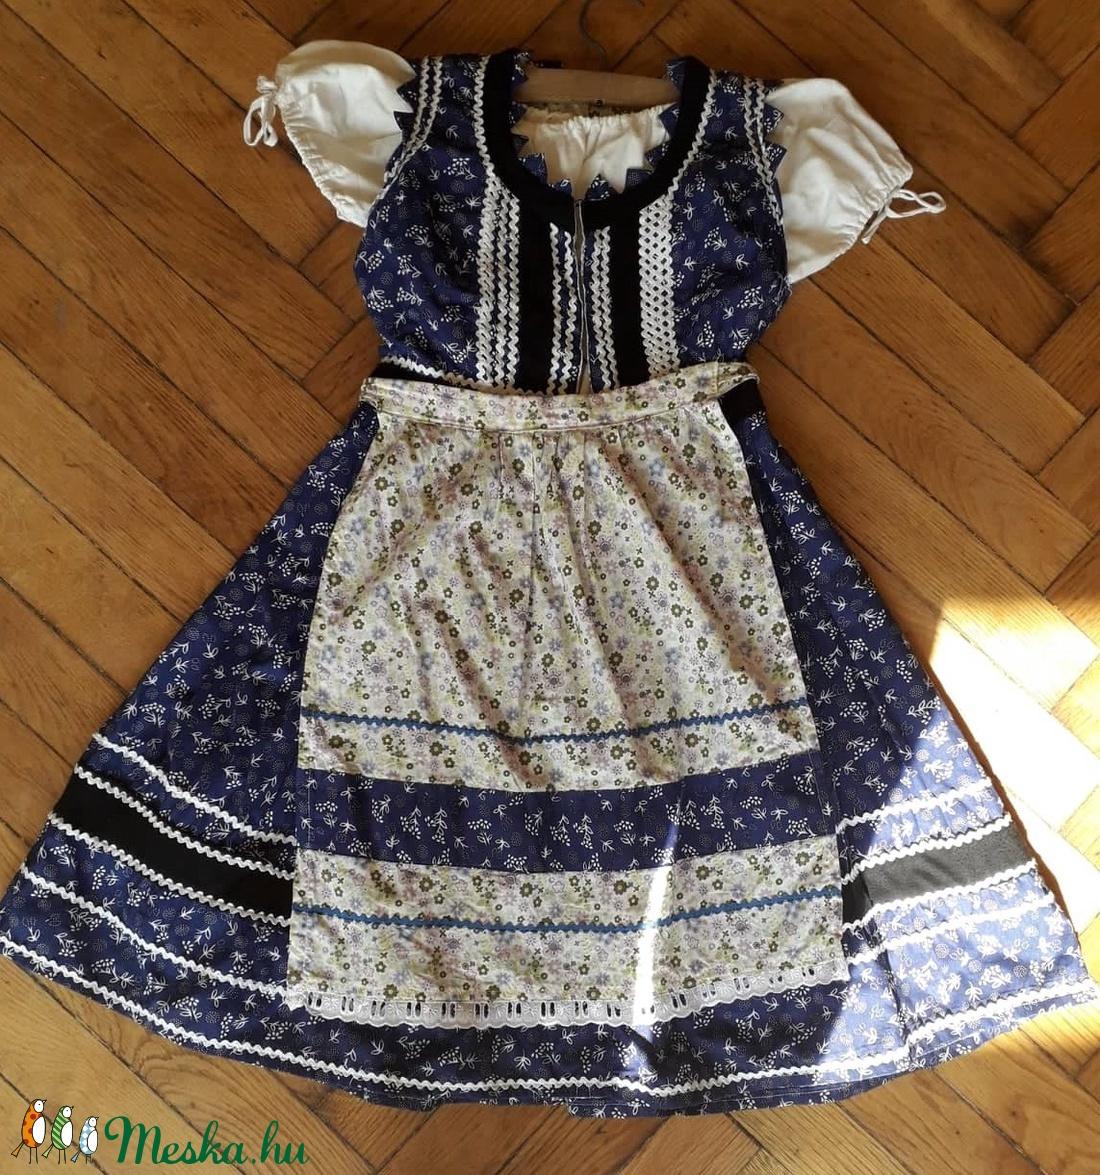 Mezőségi gyermek viselet - ruha & divat - babaruha & gyerekruha - ruha - Meska.hu